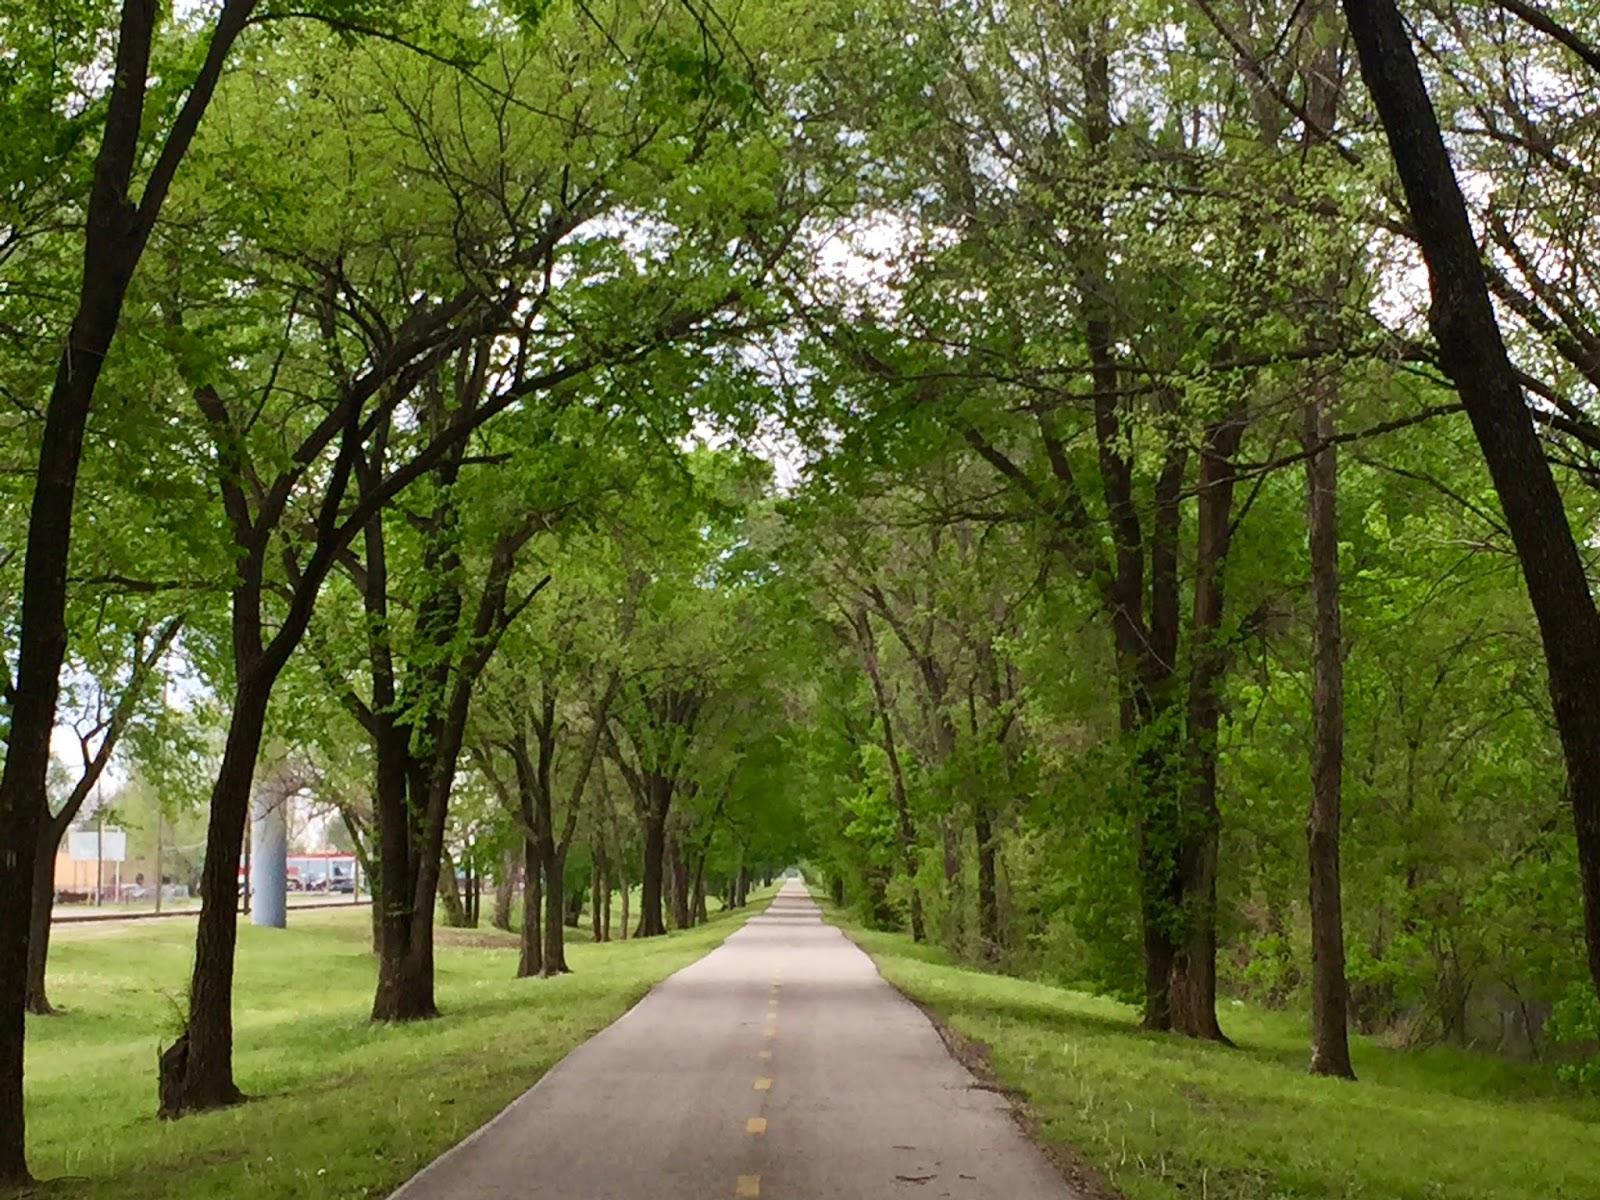 Along the Way: River Parks, Newblock, and KATY Trail ... Katy Trail